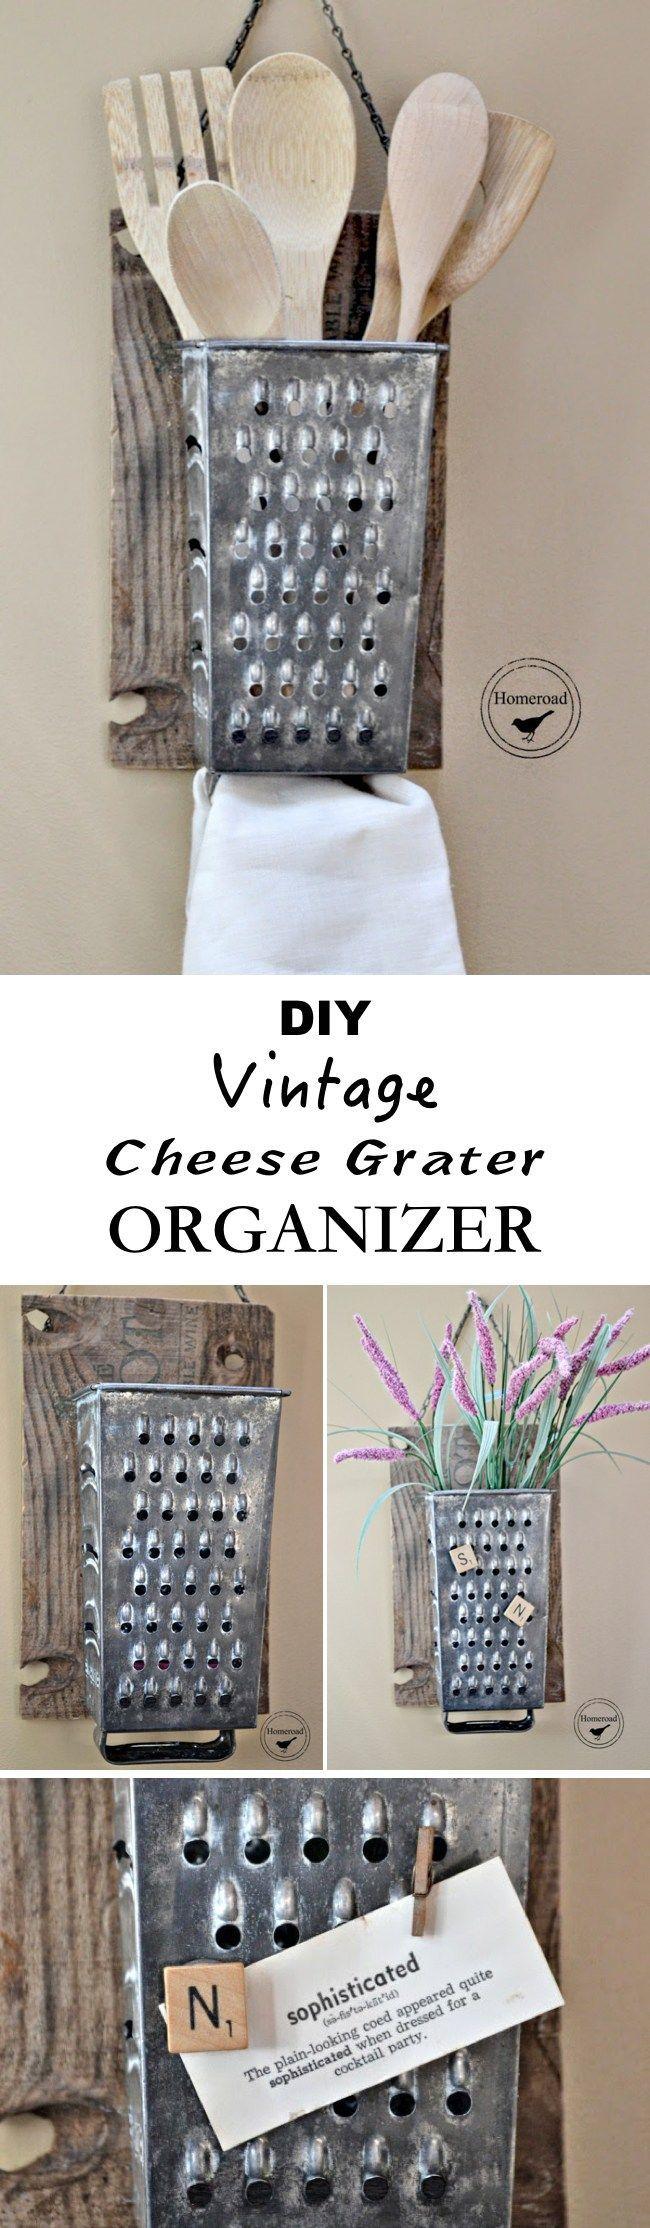 the  best grater ideas on pinterest  recycled yard art cute  -  innovative diy kitchen organization  storage ideas cheese graterkitchen